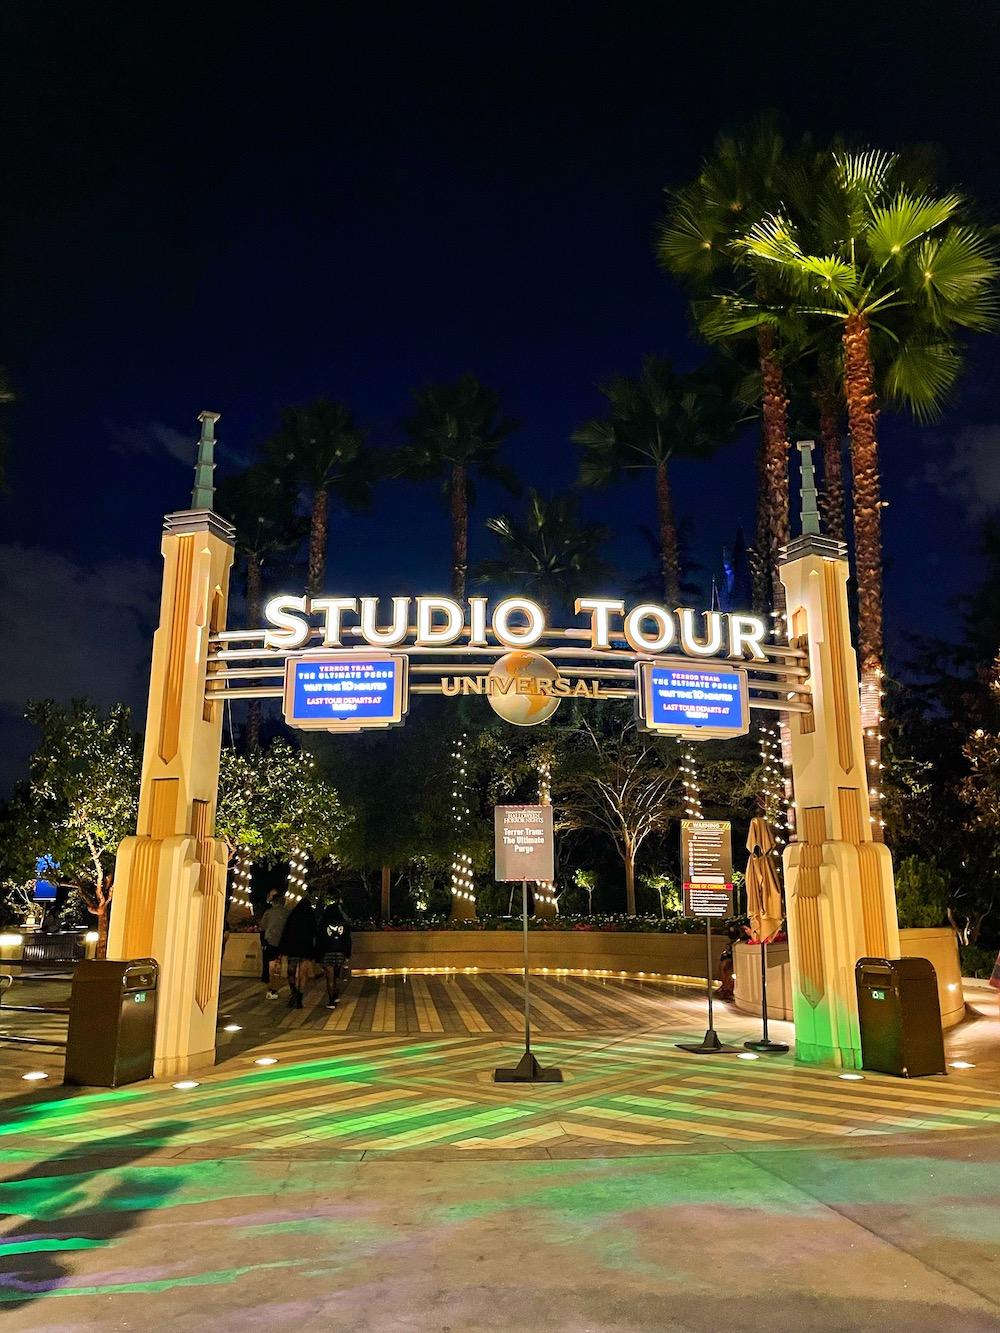 Studio Tour Halloween Horror Nights 2021 at Universal Studios Hollywood